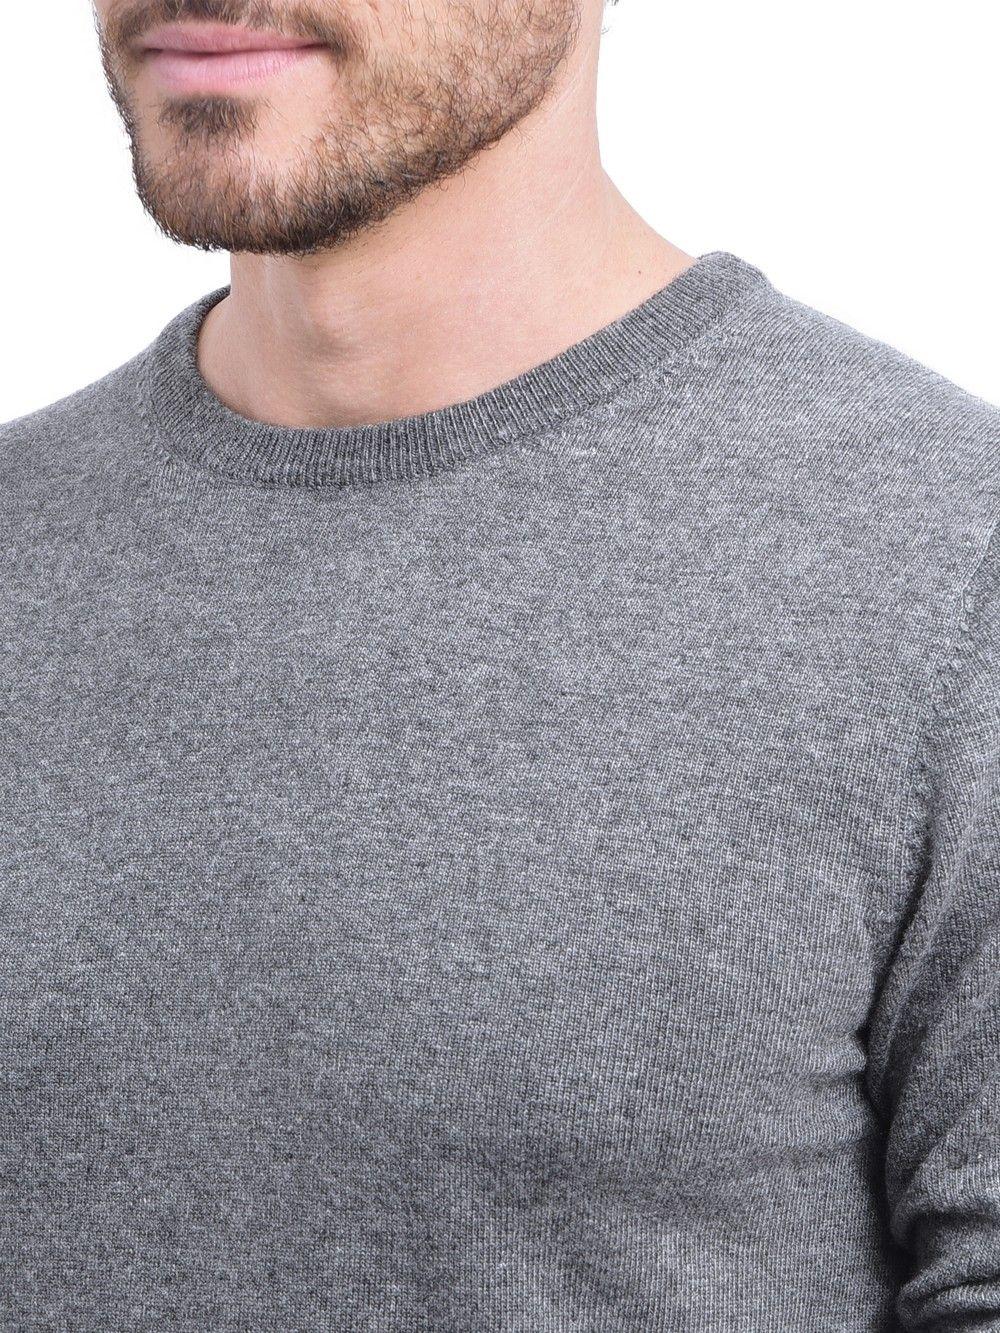 C&JO Round Neck Sweater in Grey